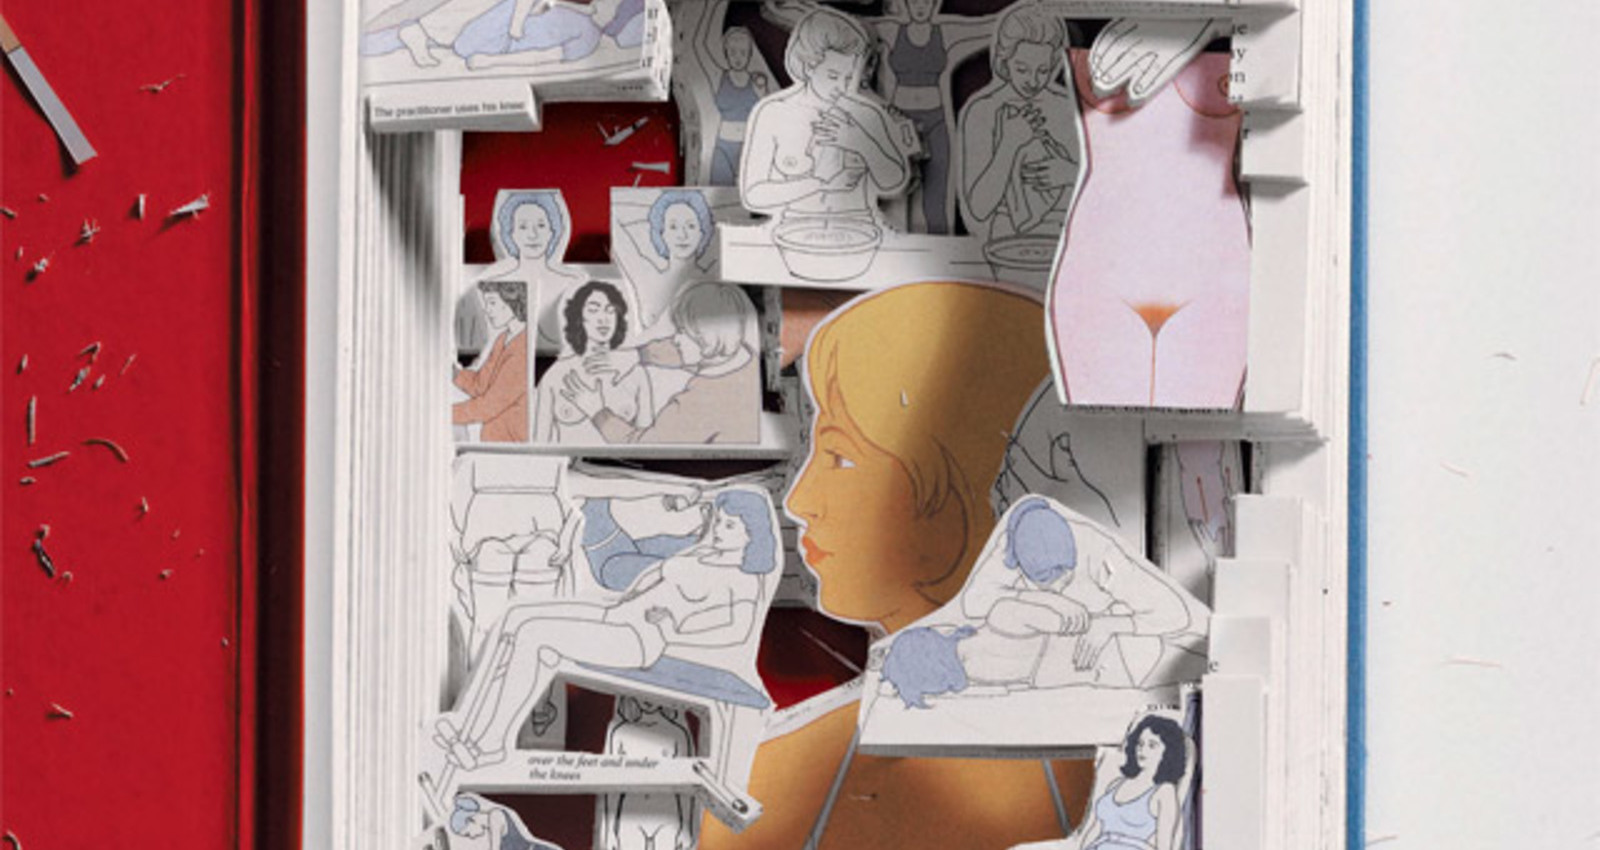 Renaissance Art, Superheroes Comic, Beauty & Wellness, Family Health